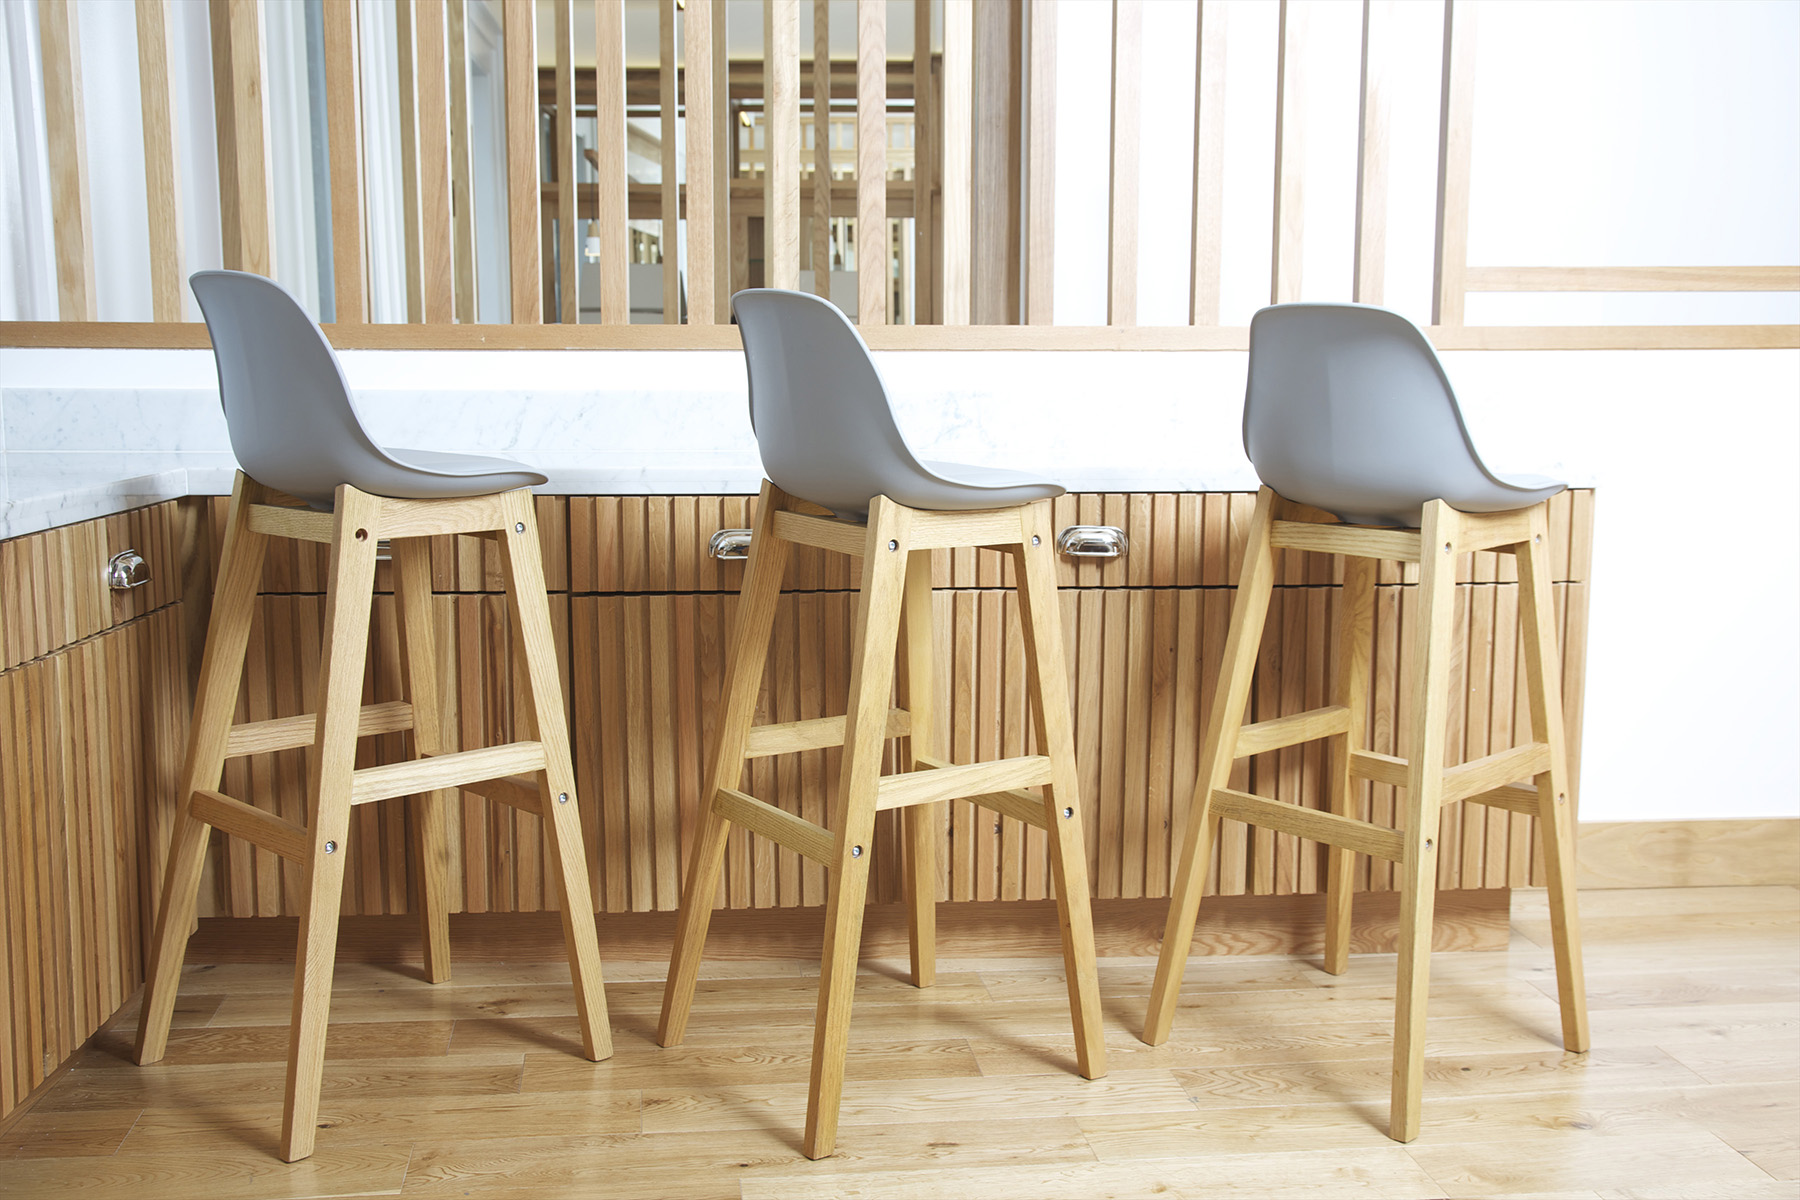 2 OSLO Beauty - Furniture